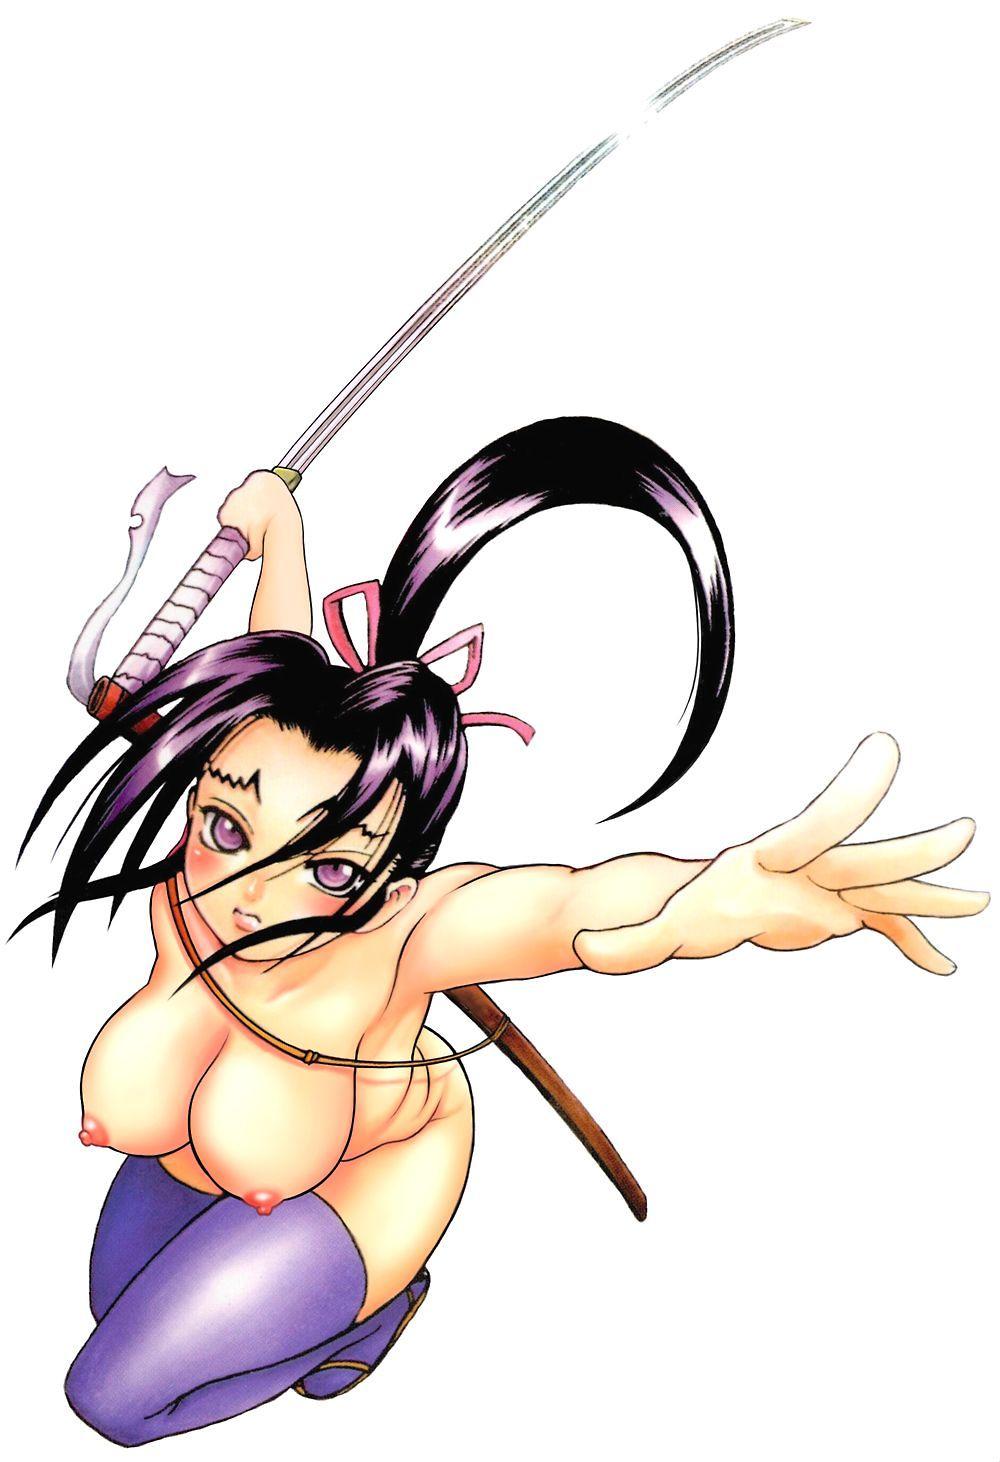 shigure the disciple kenichi mightiest Eren and mikasa have sex